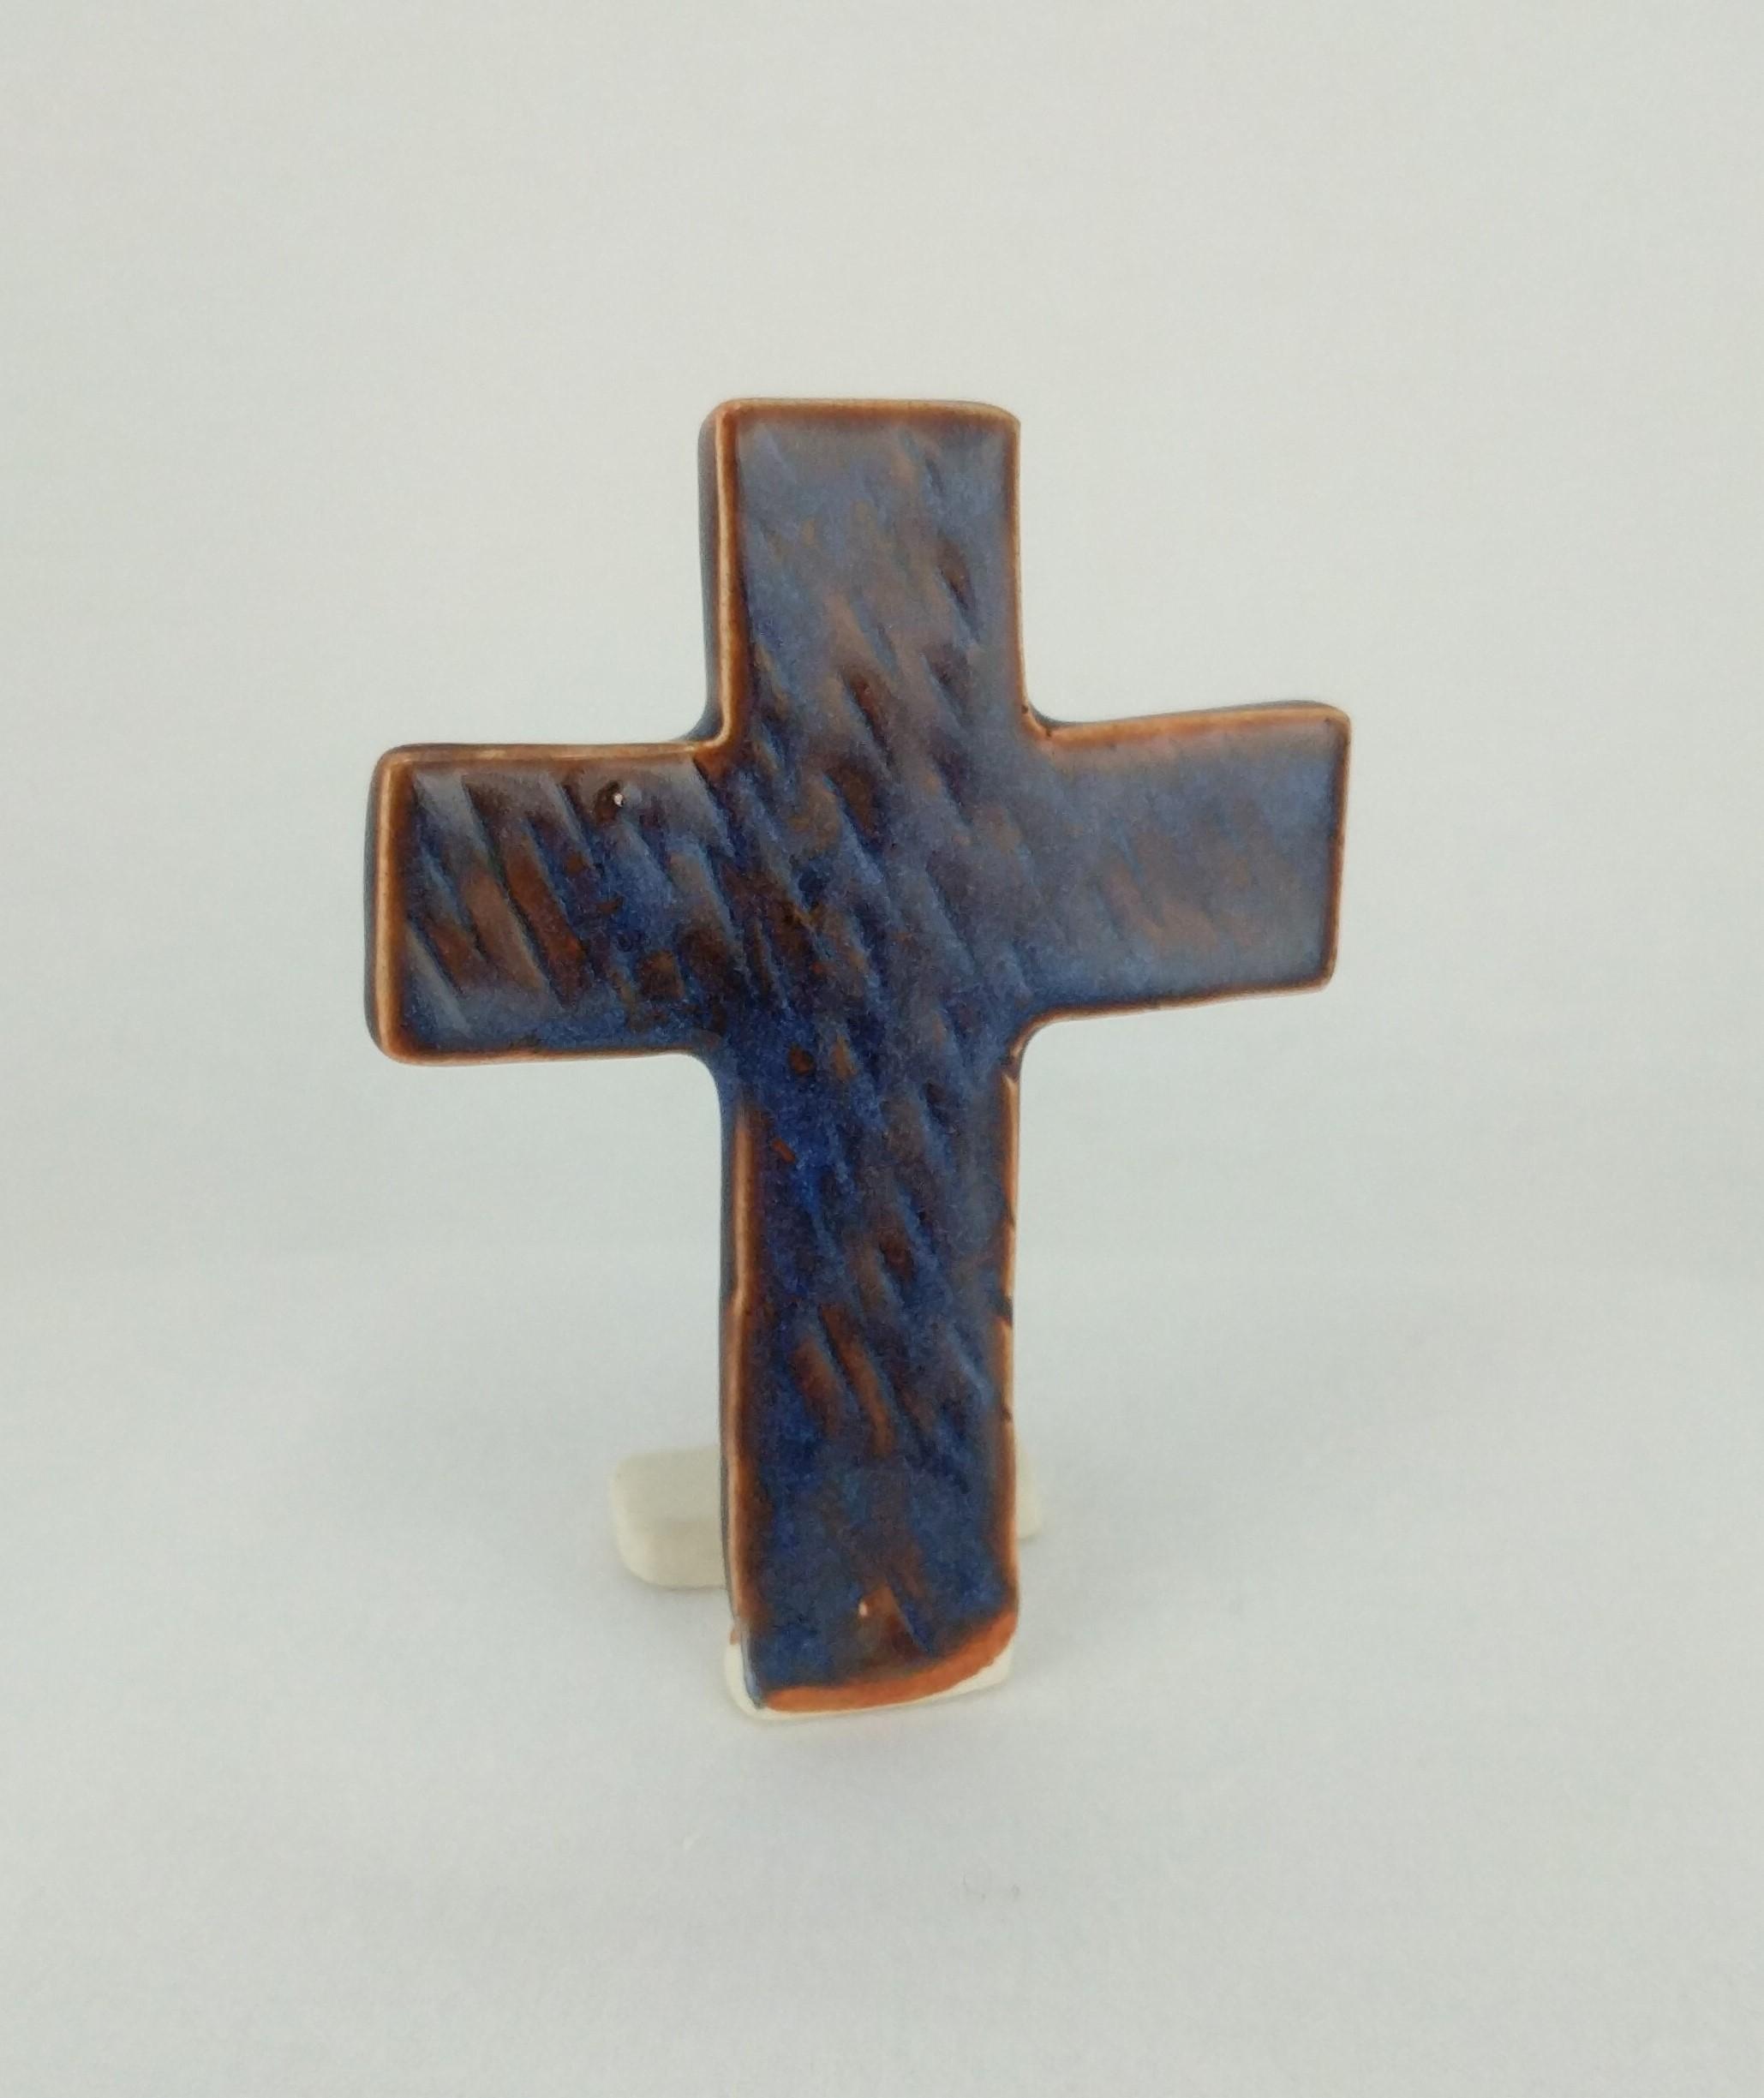 Textured Cross